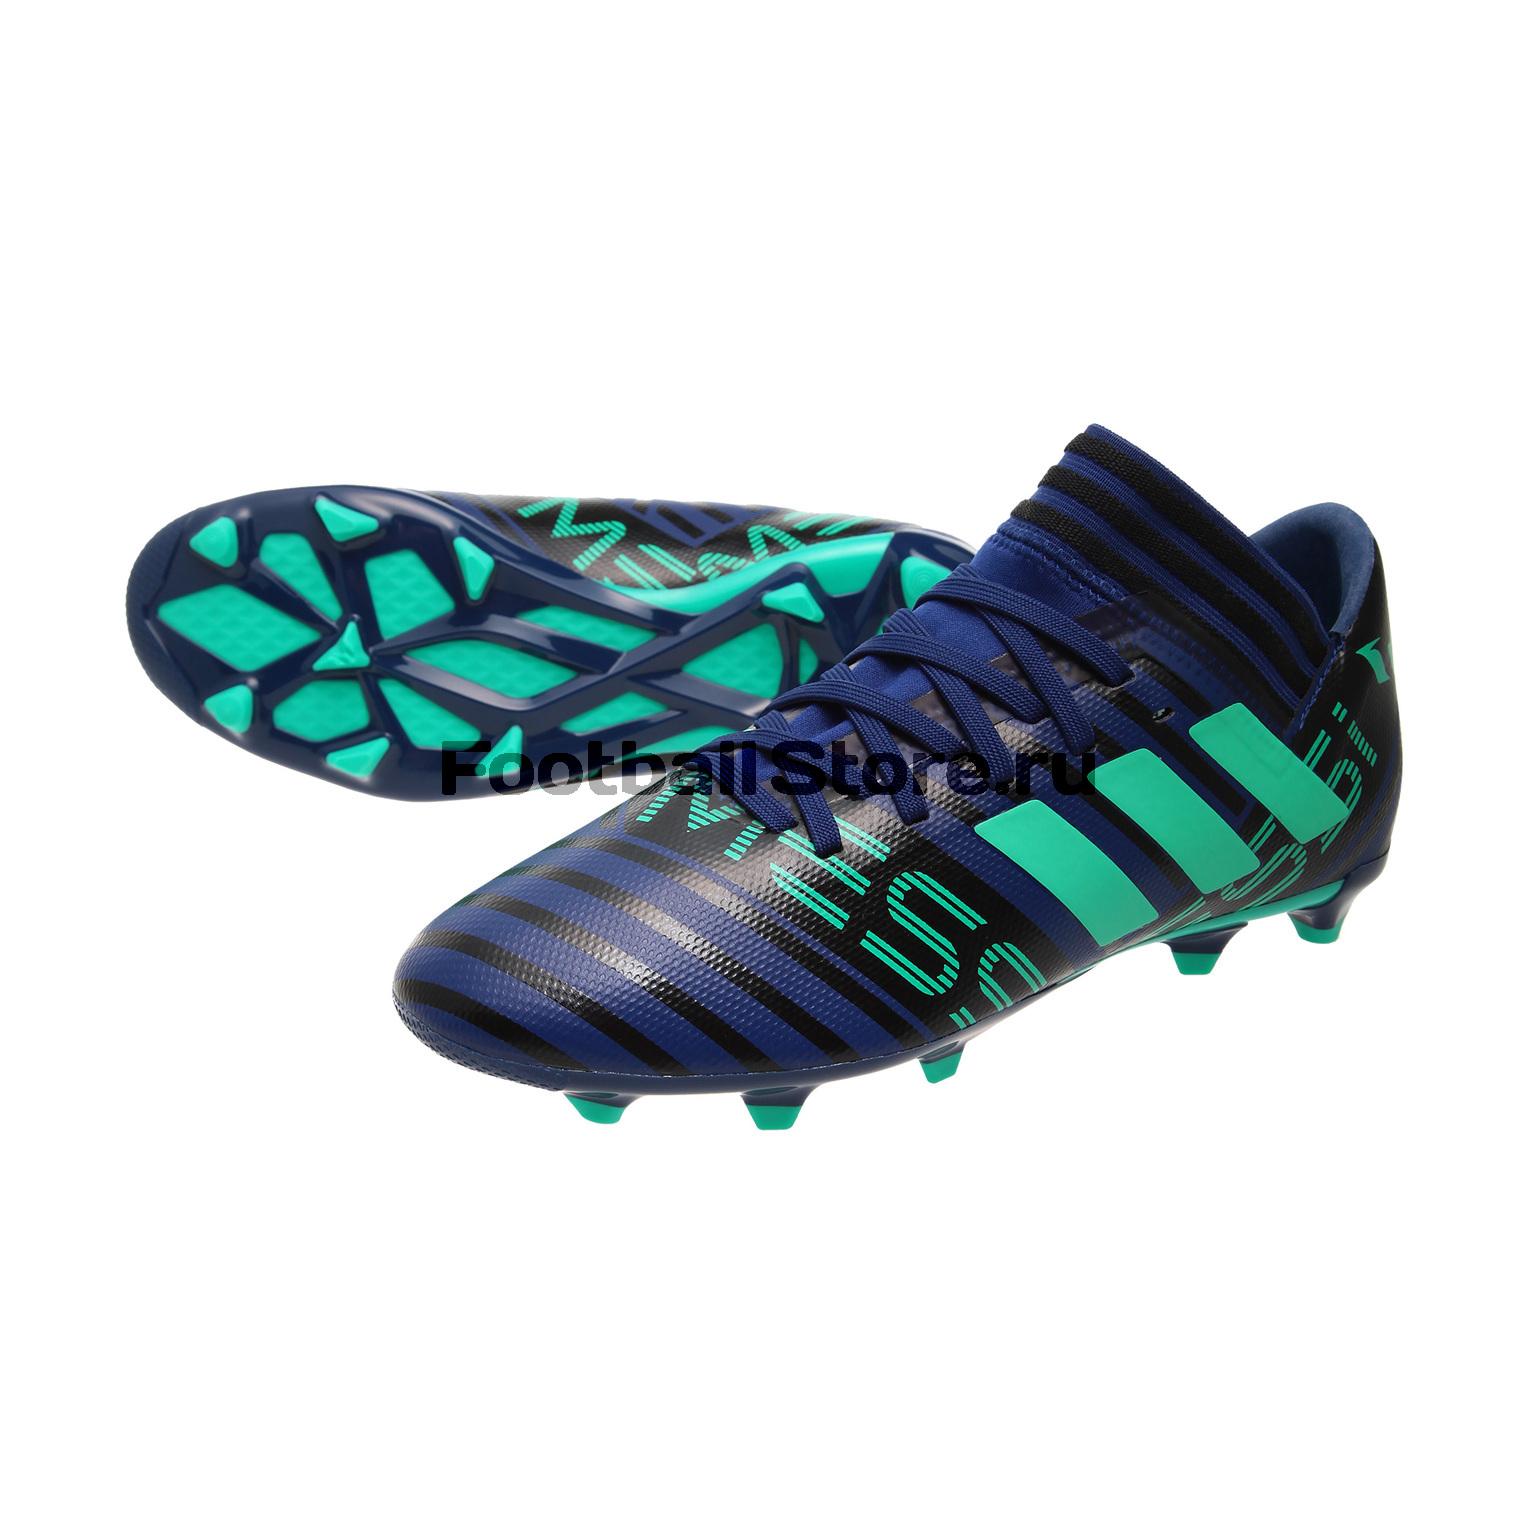 Бутсы Adidas Nemeziz Messi 17.3 FG JR CP9176 бутсы adidas messi 16 2 fg aq3111